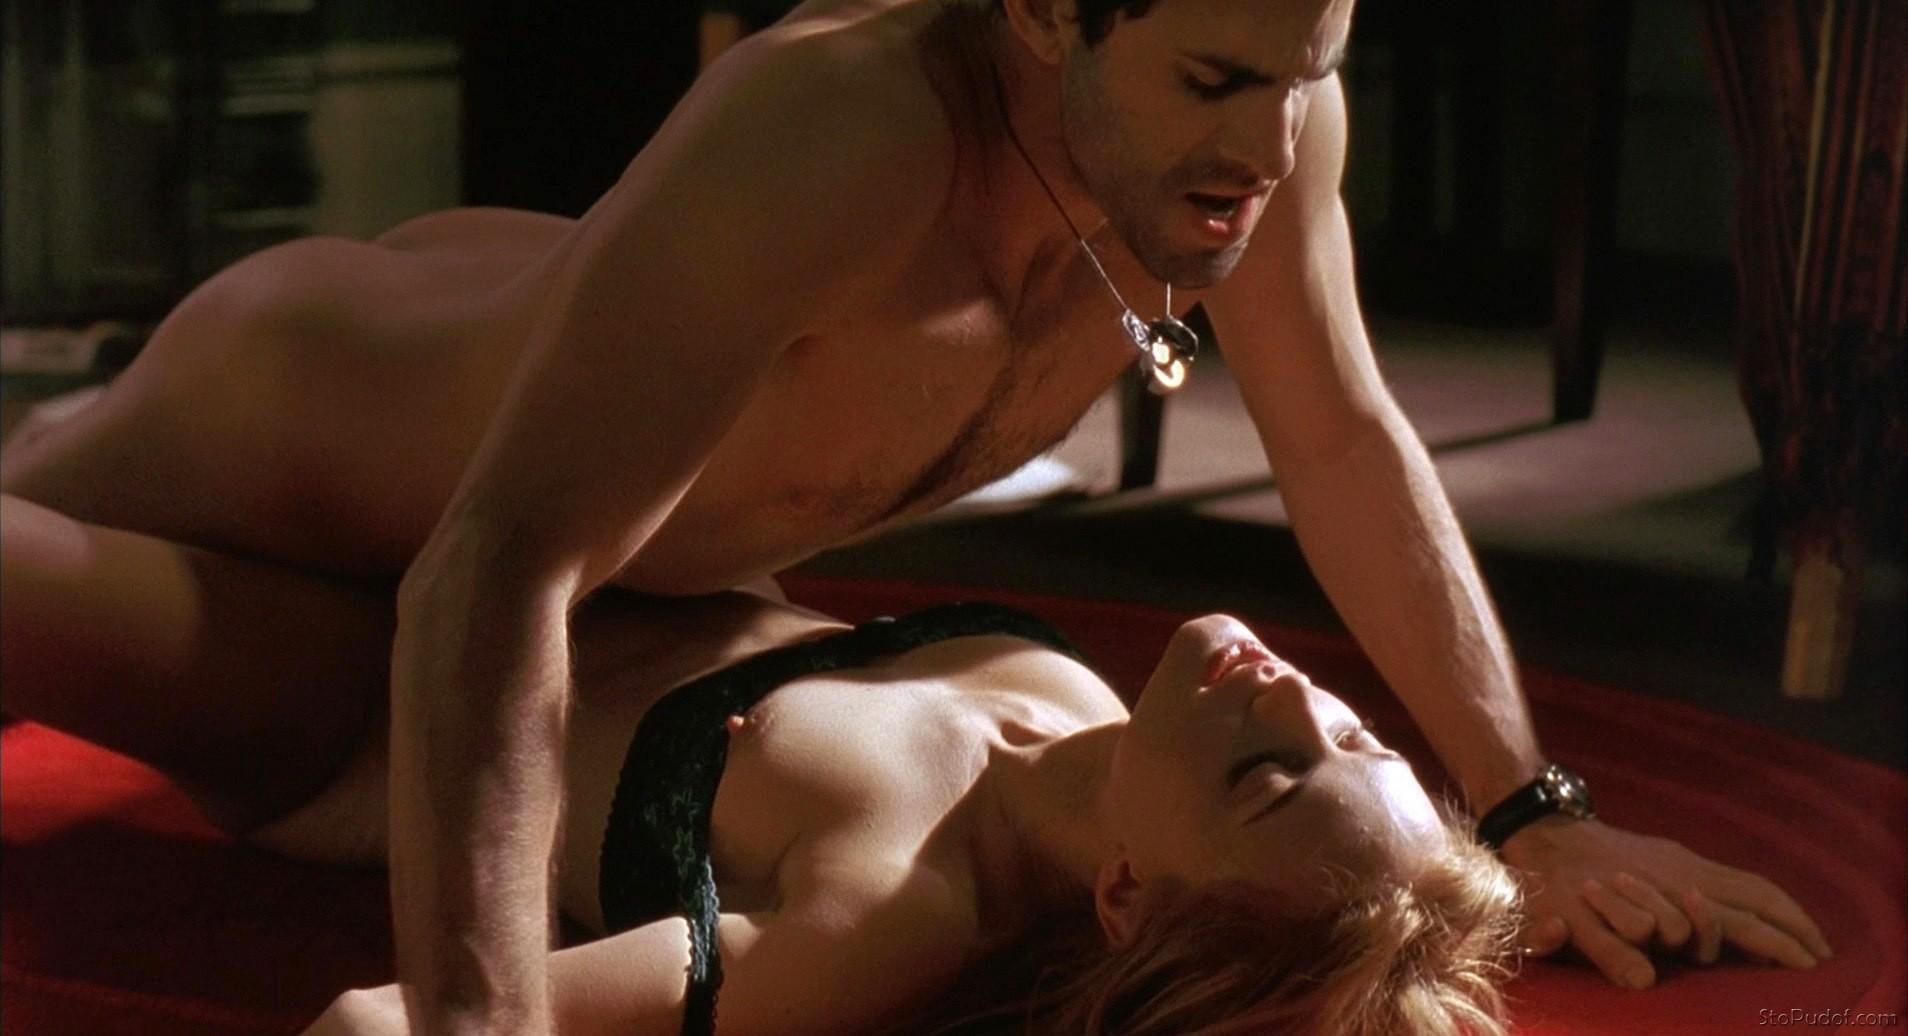 Celebrity hollywood actress sex pics